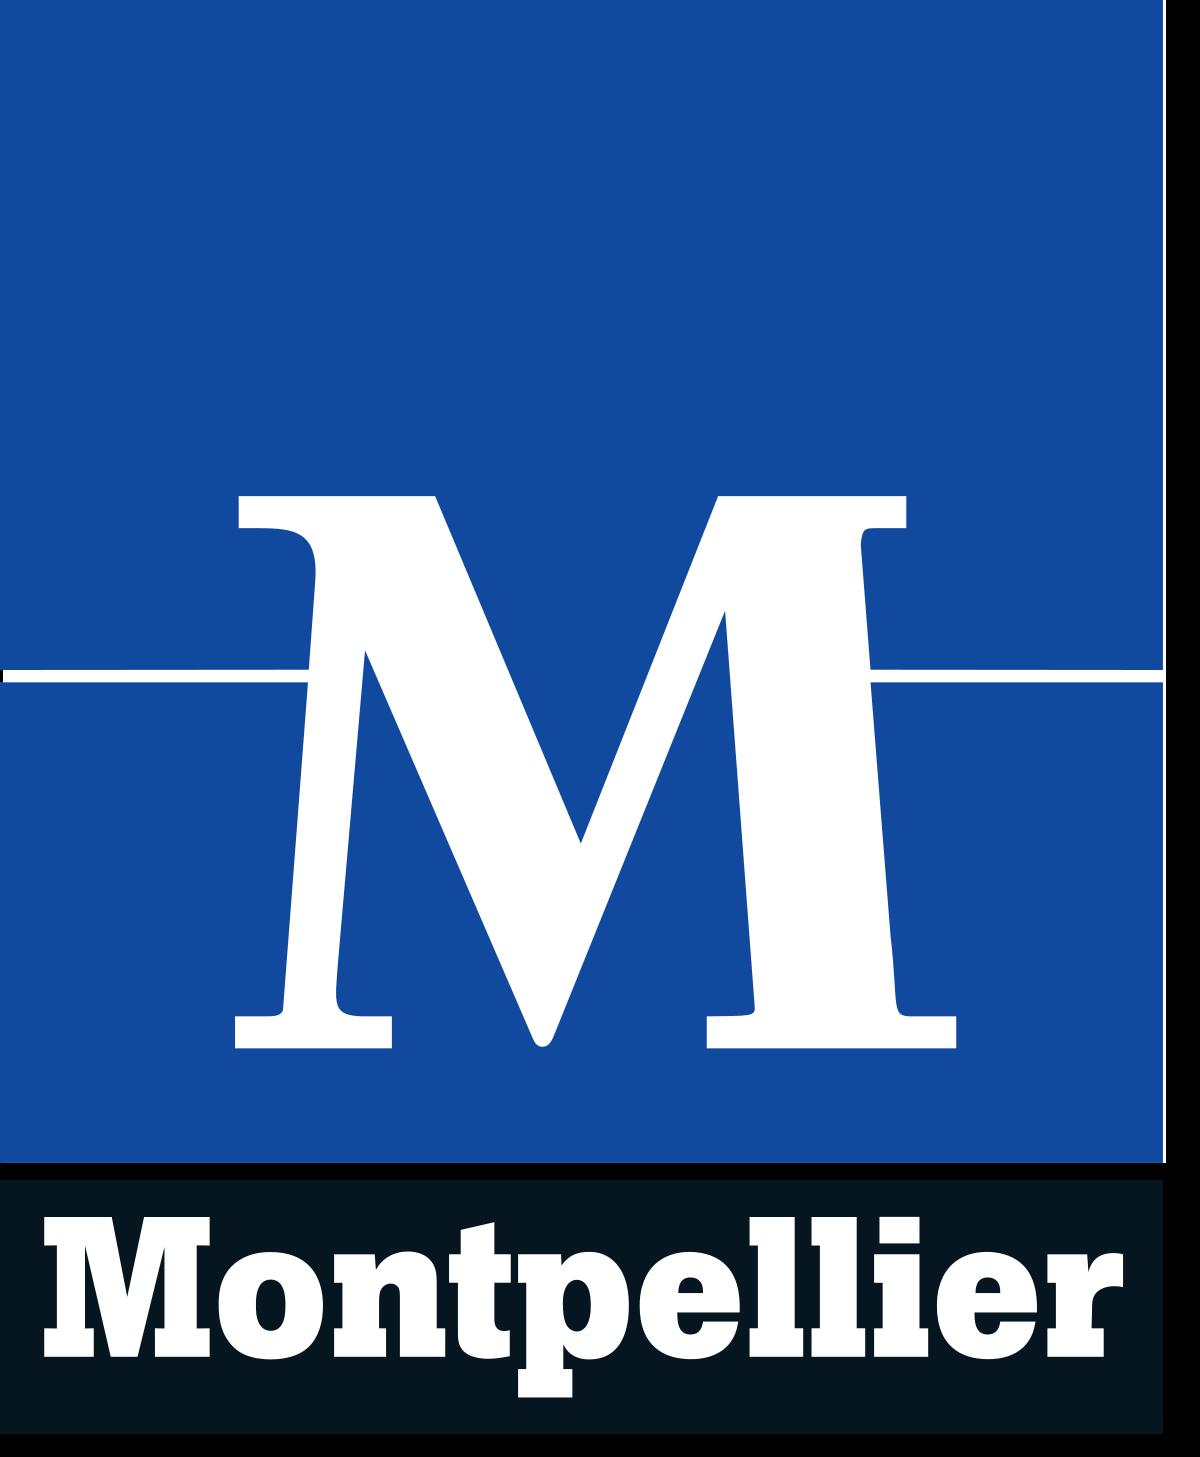 Ville de montpellier logo https://www.montpellier.fr/